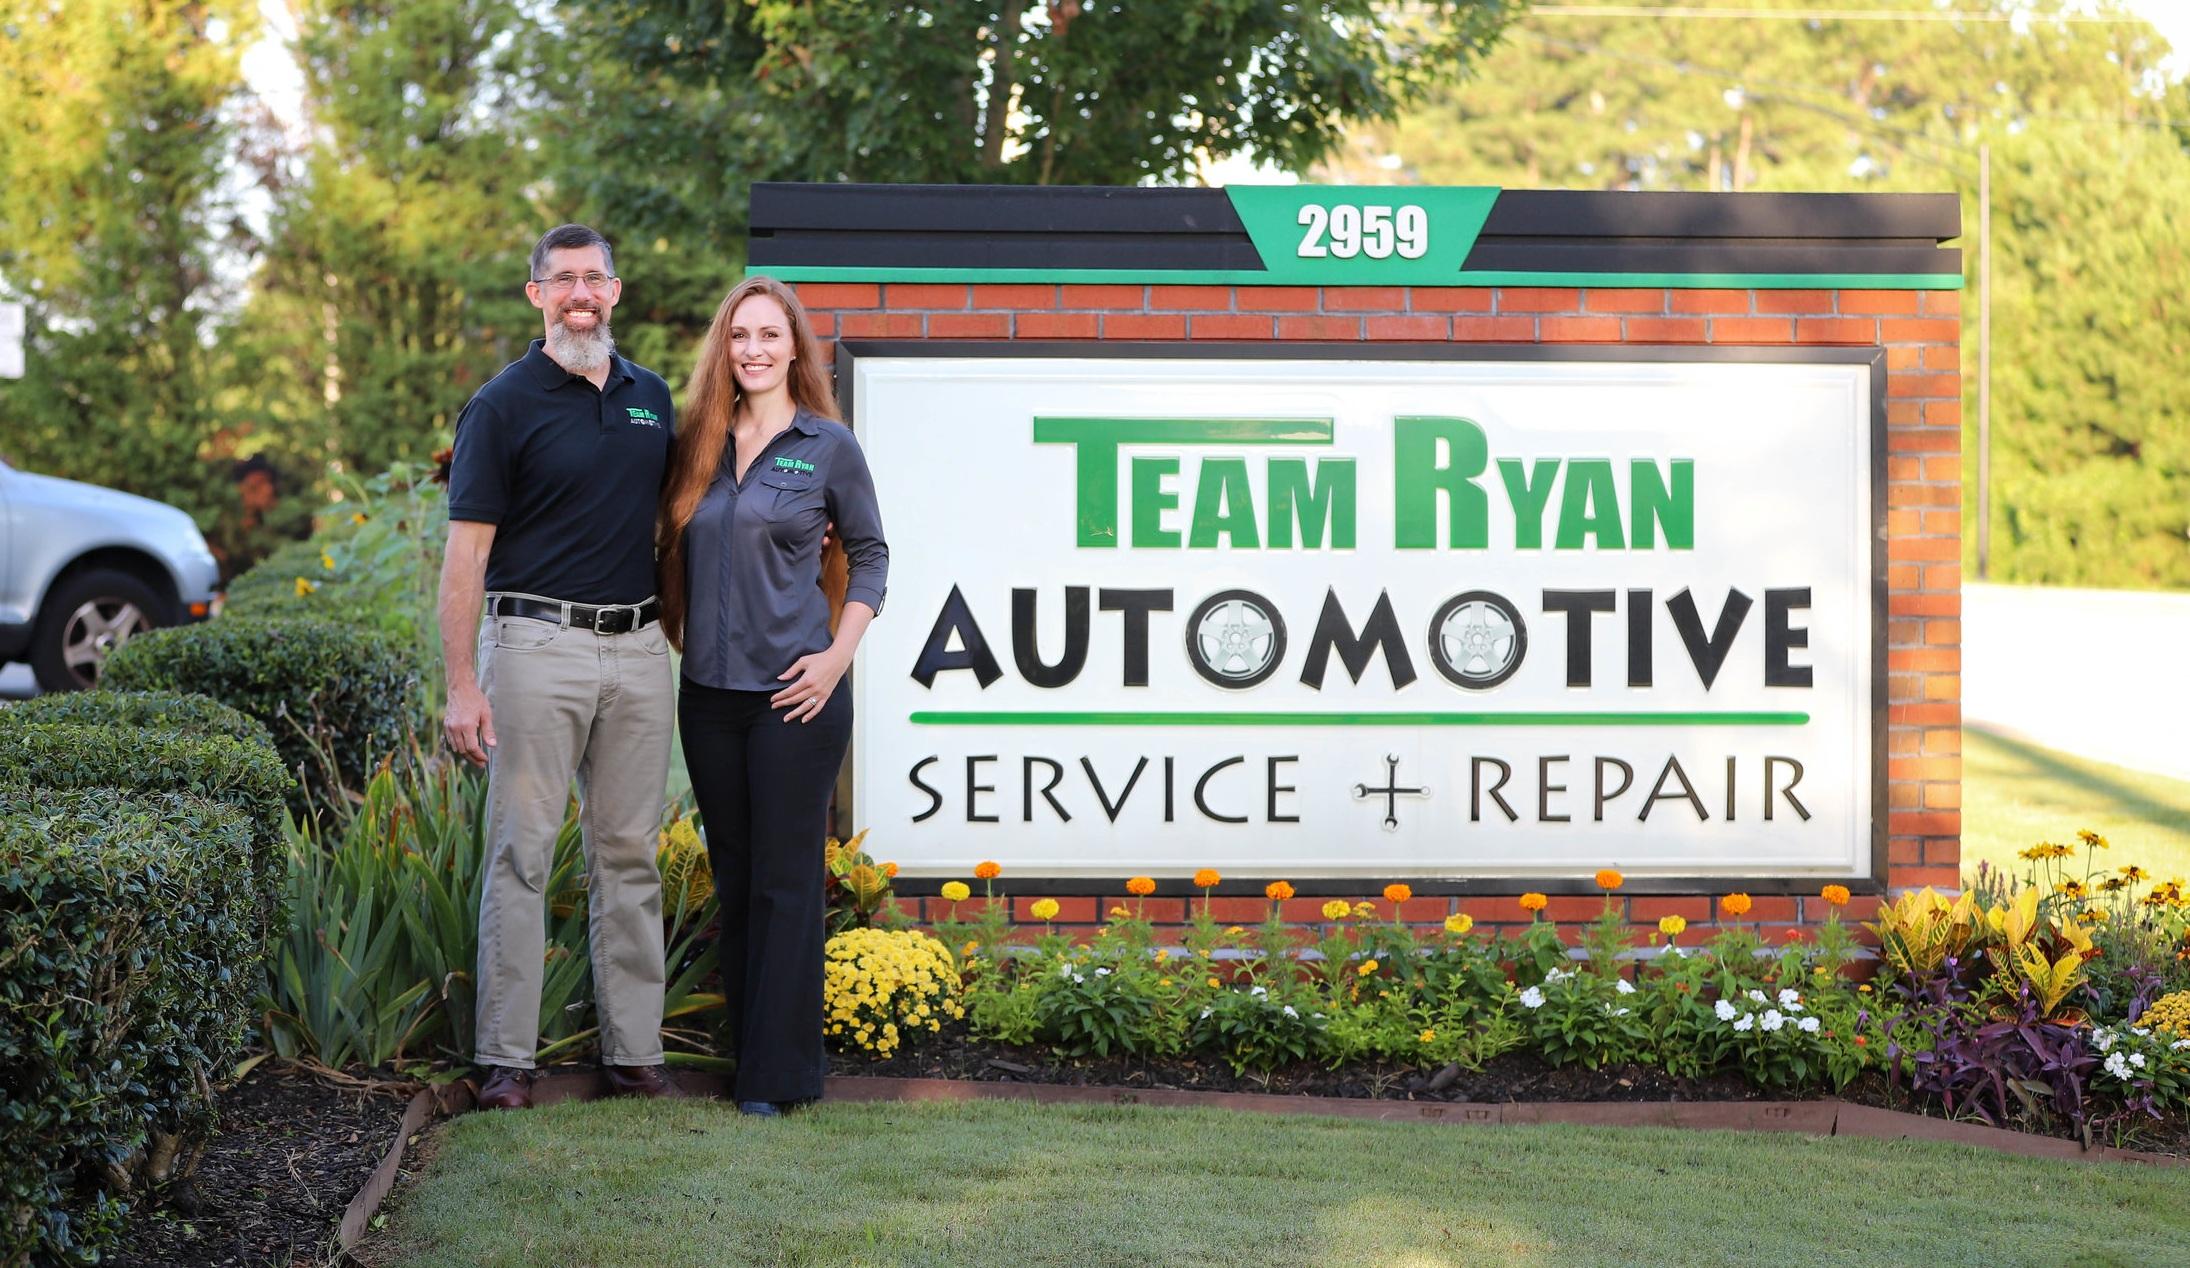 Team+Ryan+Automotive+front+sign.jpg